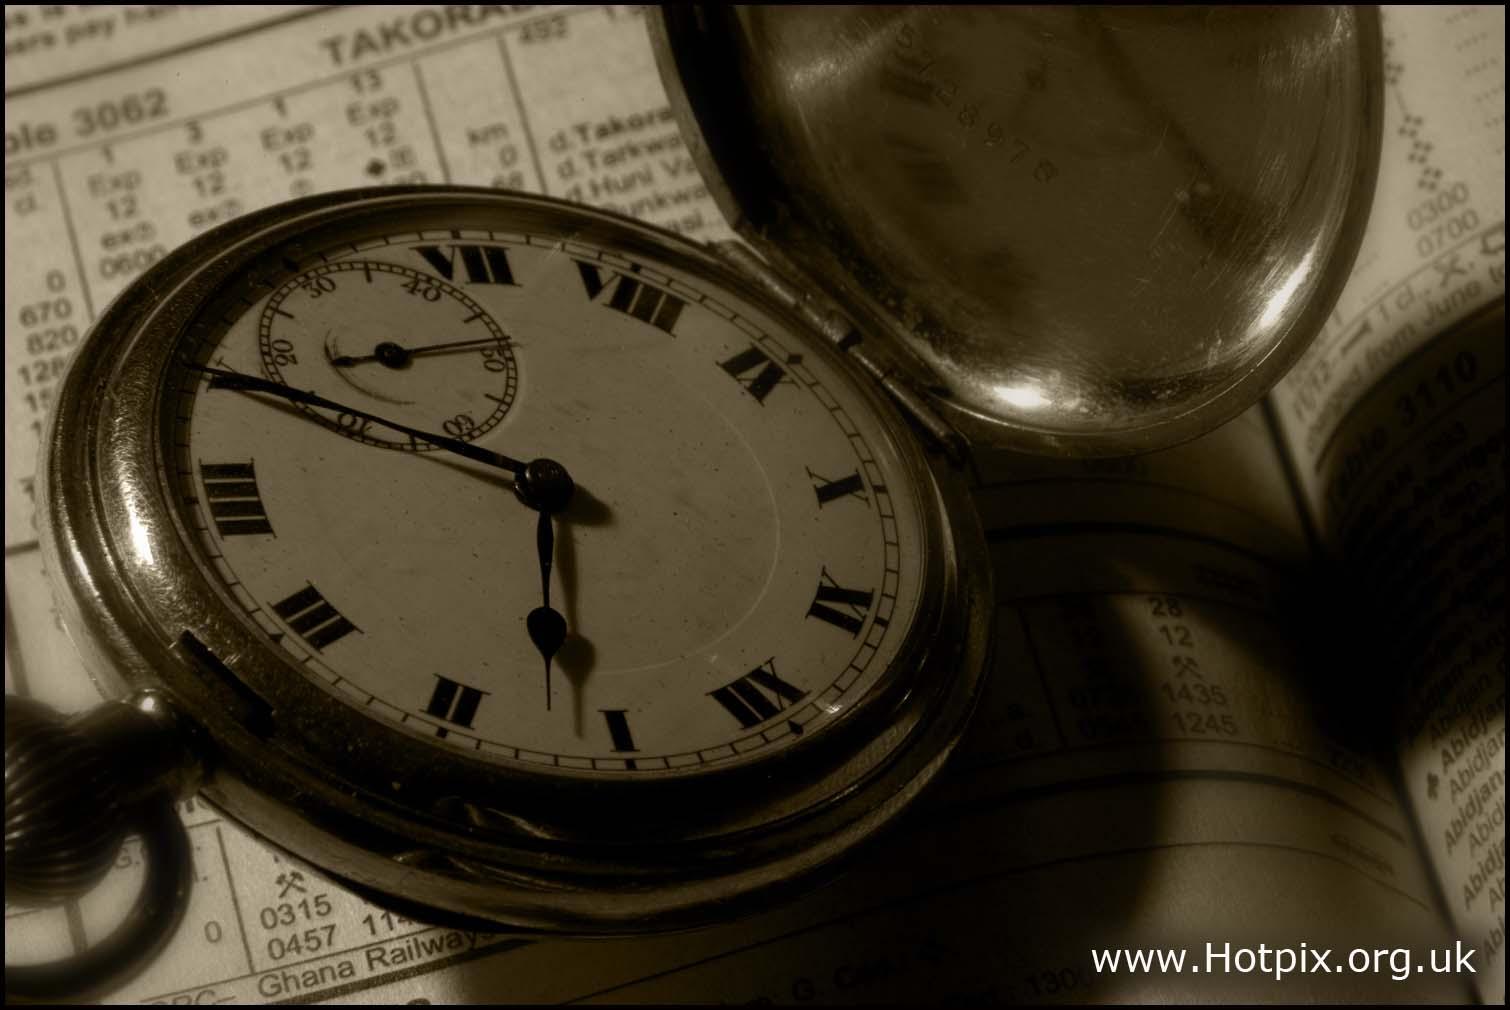 b/w,black,white,pocket,watch,gold,old,roman,numerals,timetable,time,africa,accra,ghana,sepia,toned,mono,monchrome,second,hand,hour,antique,this photo rocks,clocks,horloge,reloj,orologio,Taktgeber,hotpics,hotpic,hotpick,hotpicks,stillife,stilllife,still,life,stuff,history,hotpix!